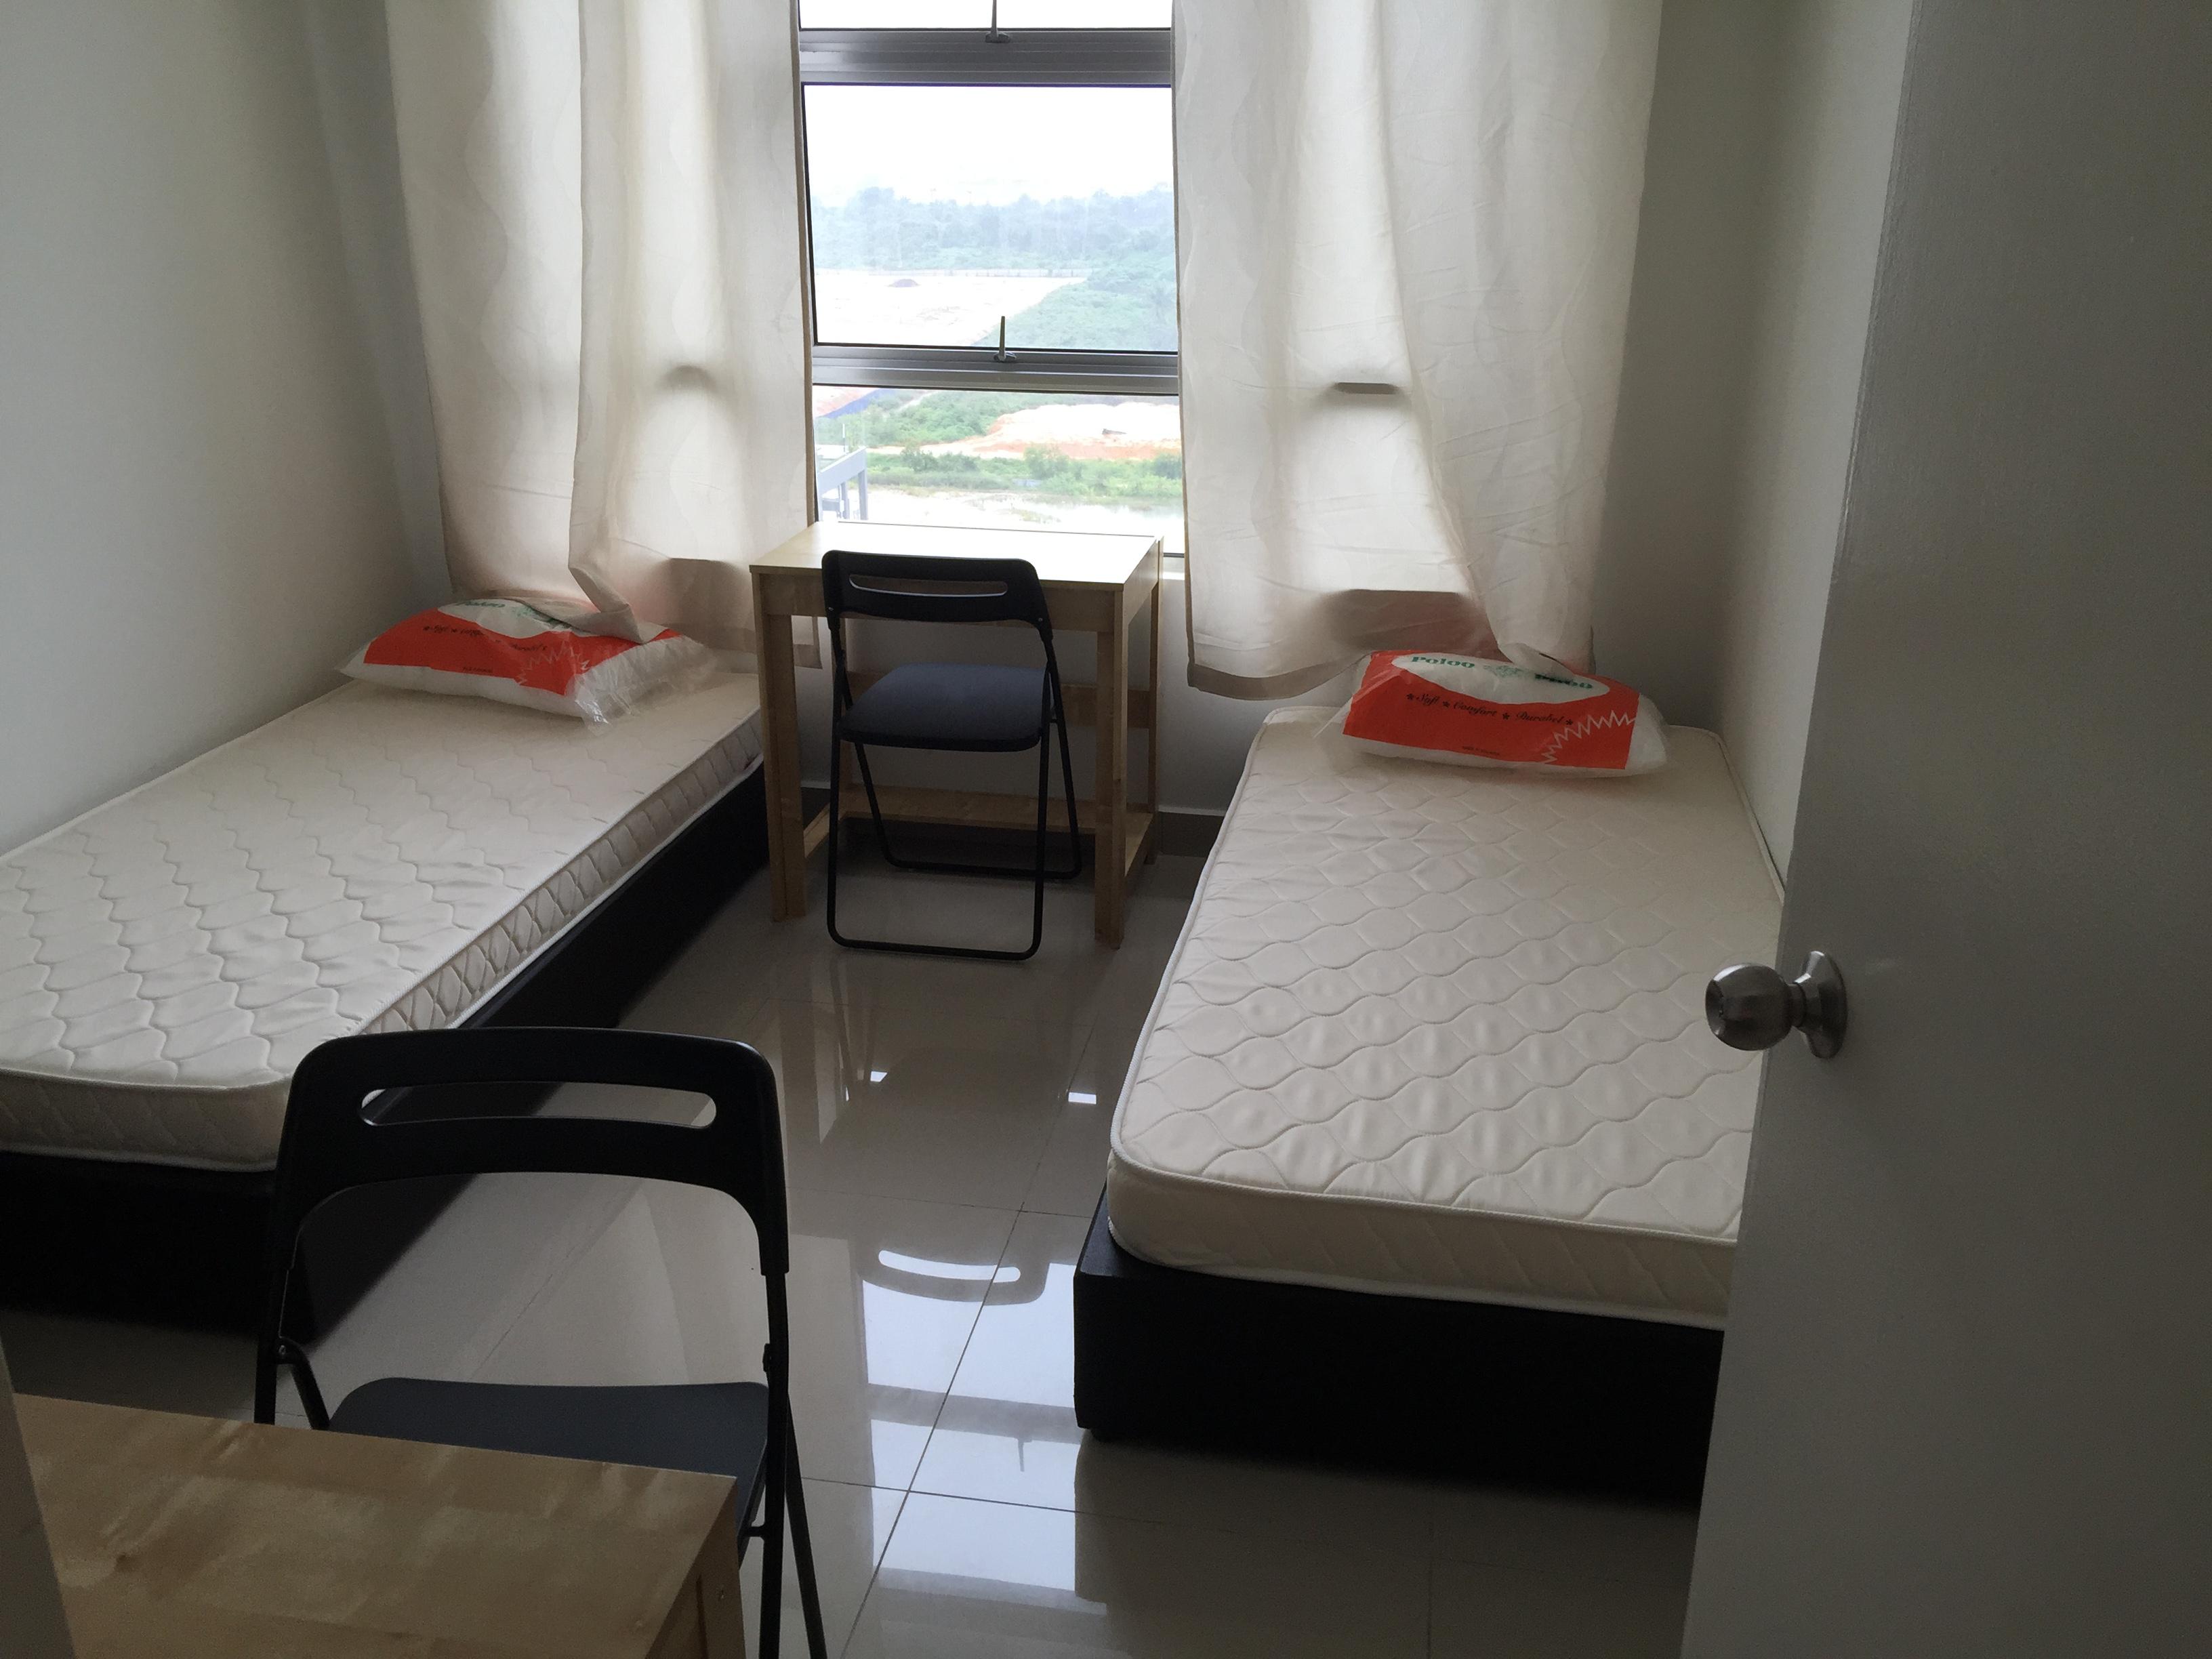 Heriot Watt University Malaysia Hostel Accommodation At